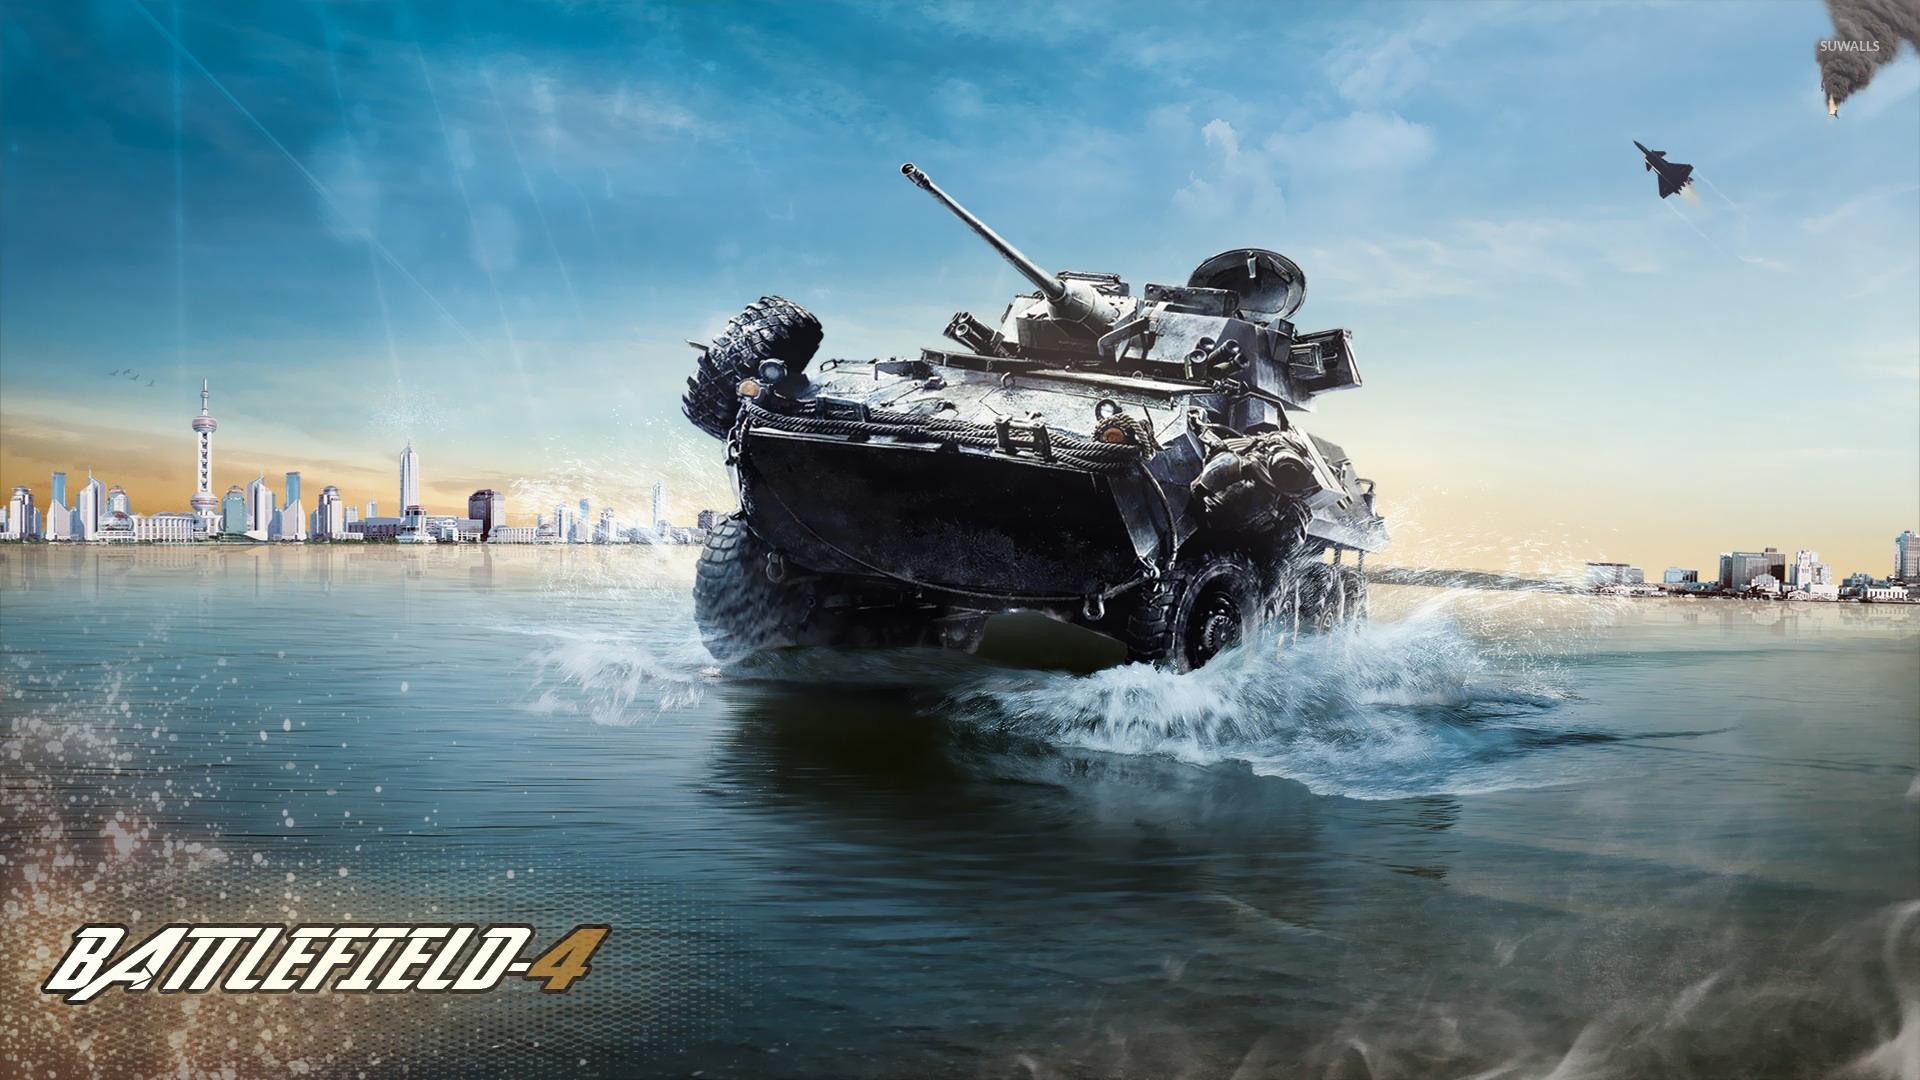 Battlefield 4 15 Wallpaper Game Wallpapers 21664